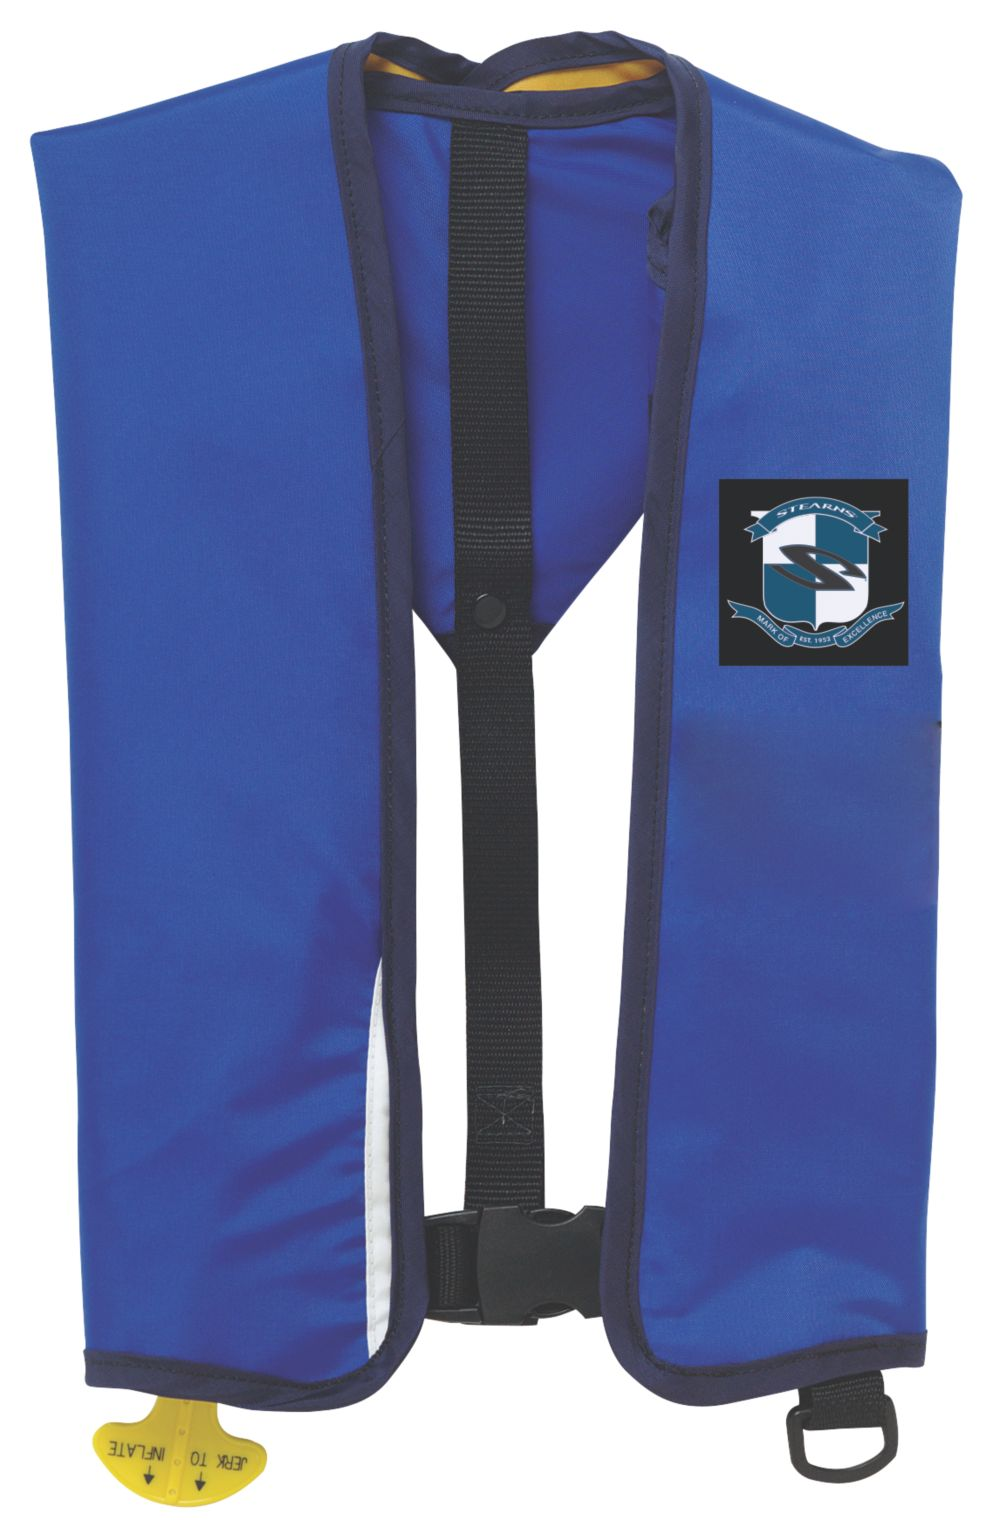 1271 Manual Inflatable Life Jacket